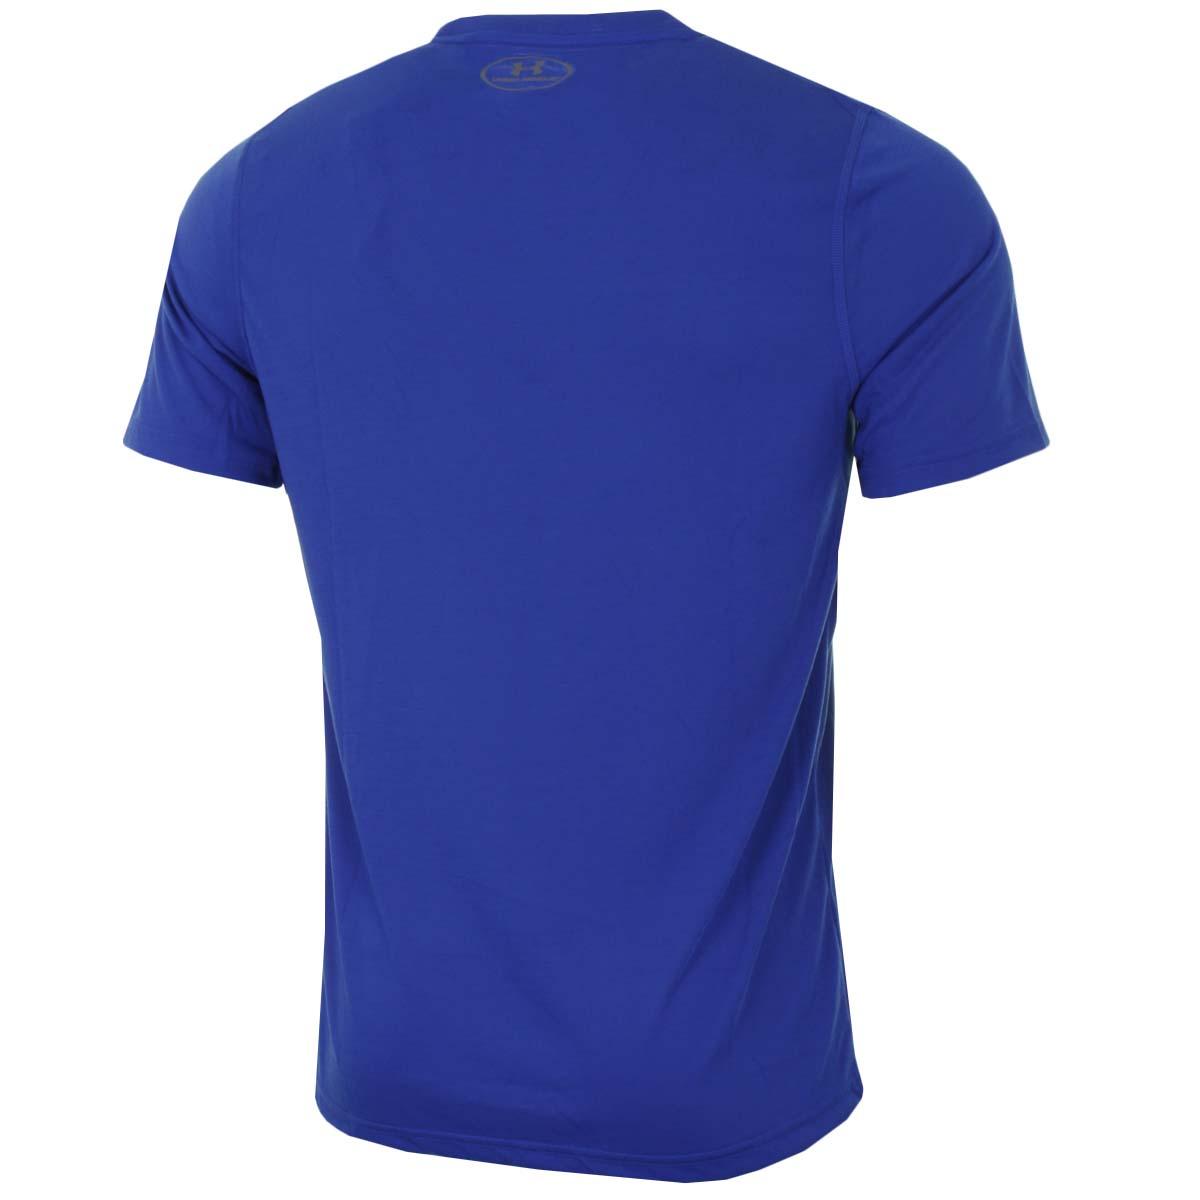 Under-Armour-Mens-UA-Threadborne-Fitted-Short-Sleeve-Gym-Tee-Sport-T-Shirt thumbnail 34